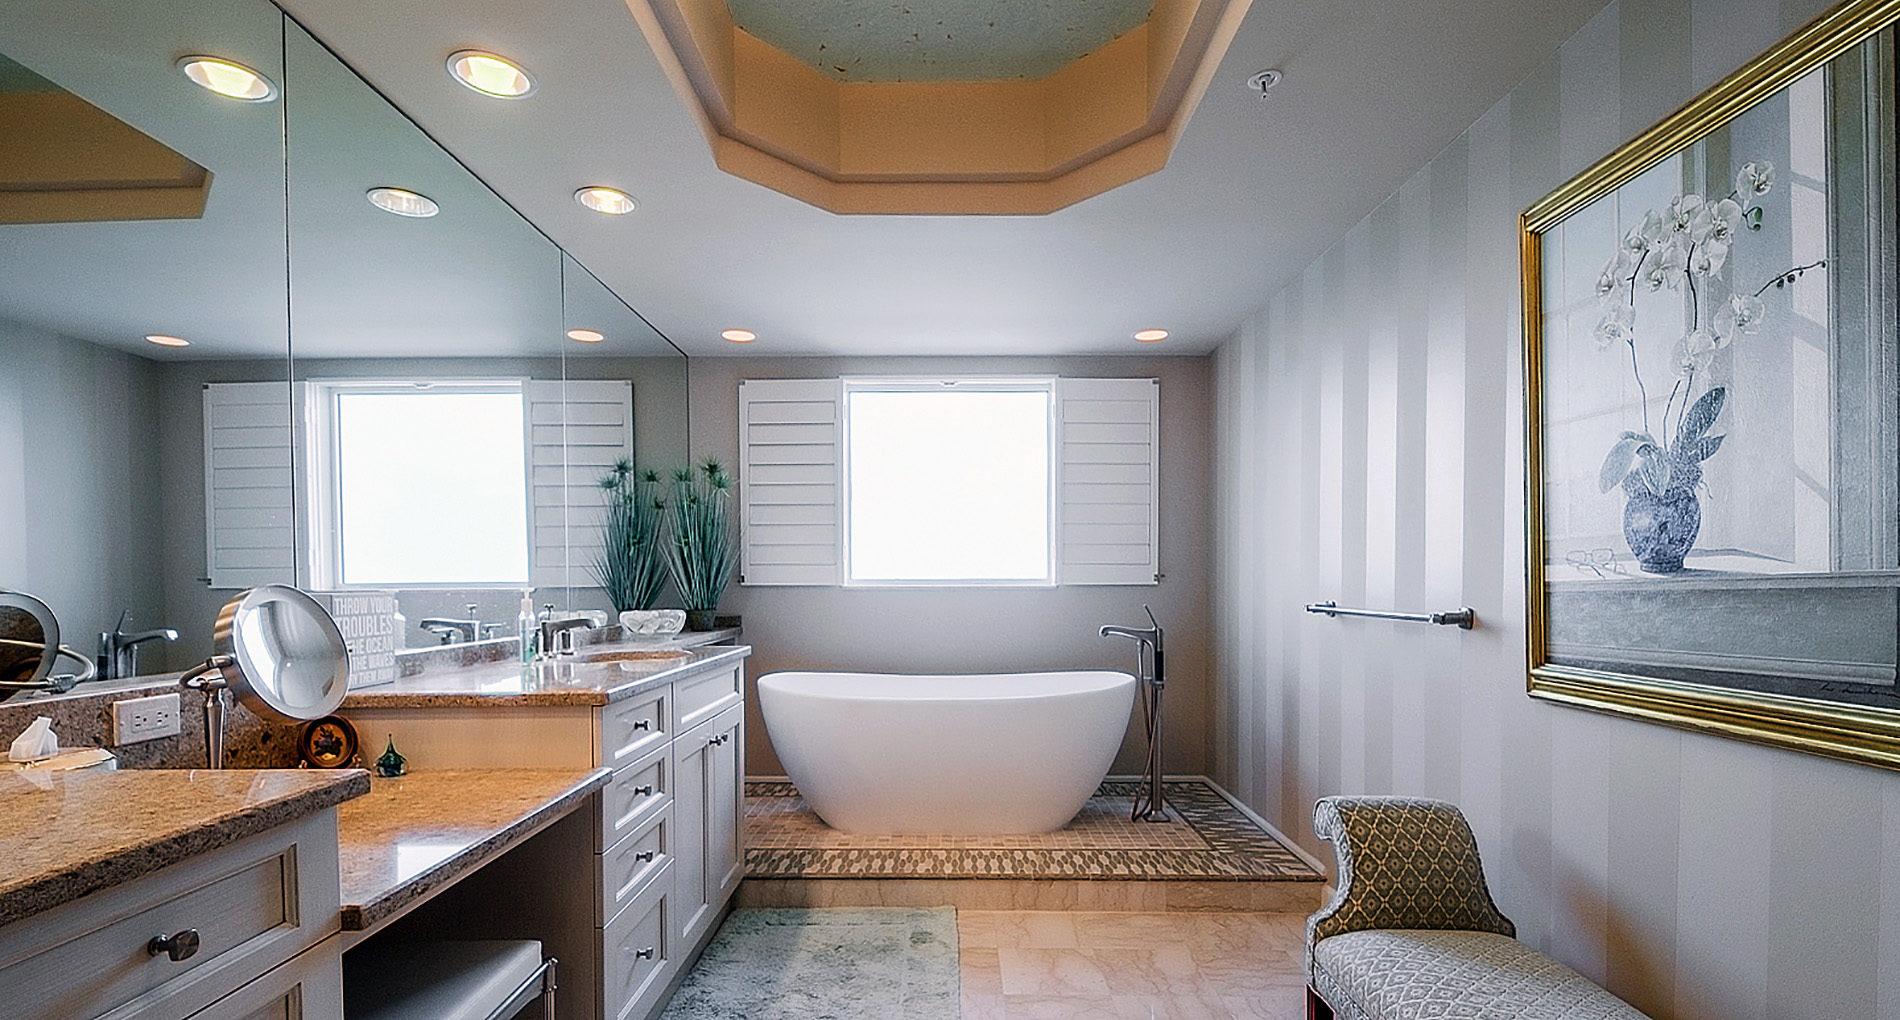 Bathroom Remodel Sanibel Baycolony Slider